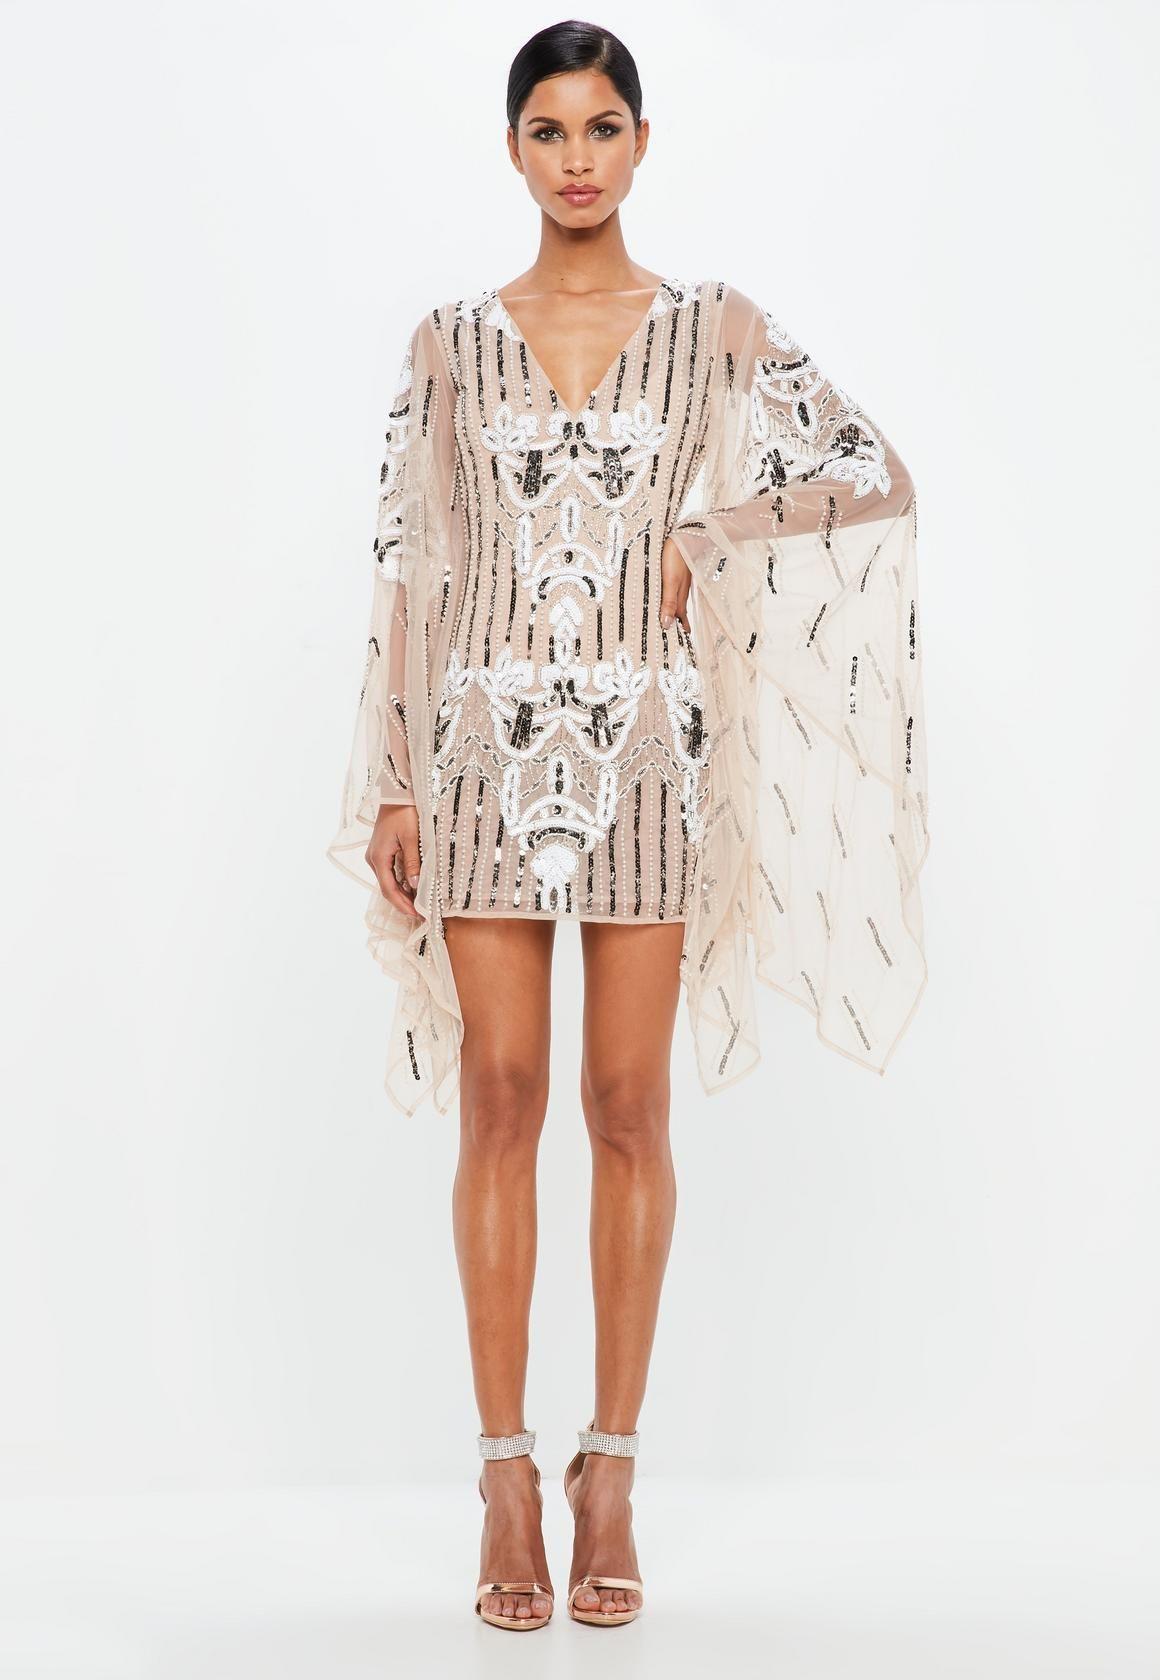 73c8f38fe9 Missguided - Peace Love Nude Kimono Sleeve Embellished Plunge Dress ...